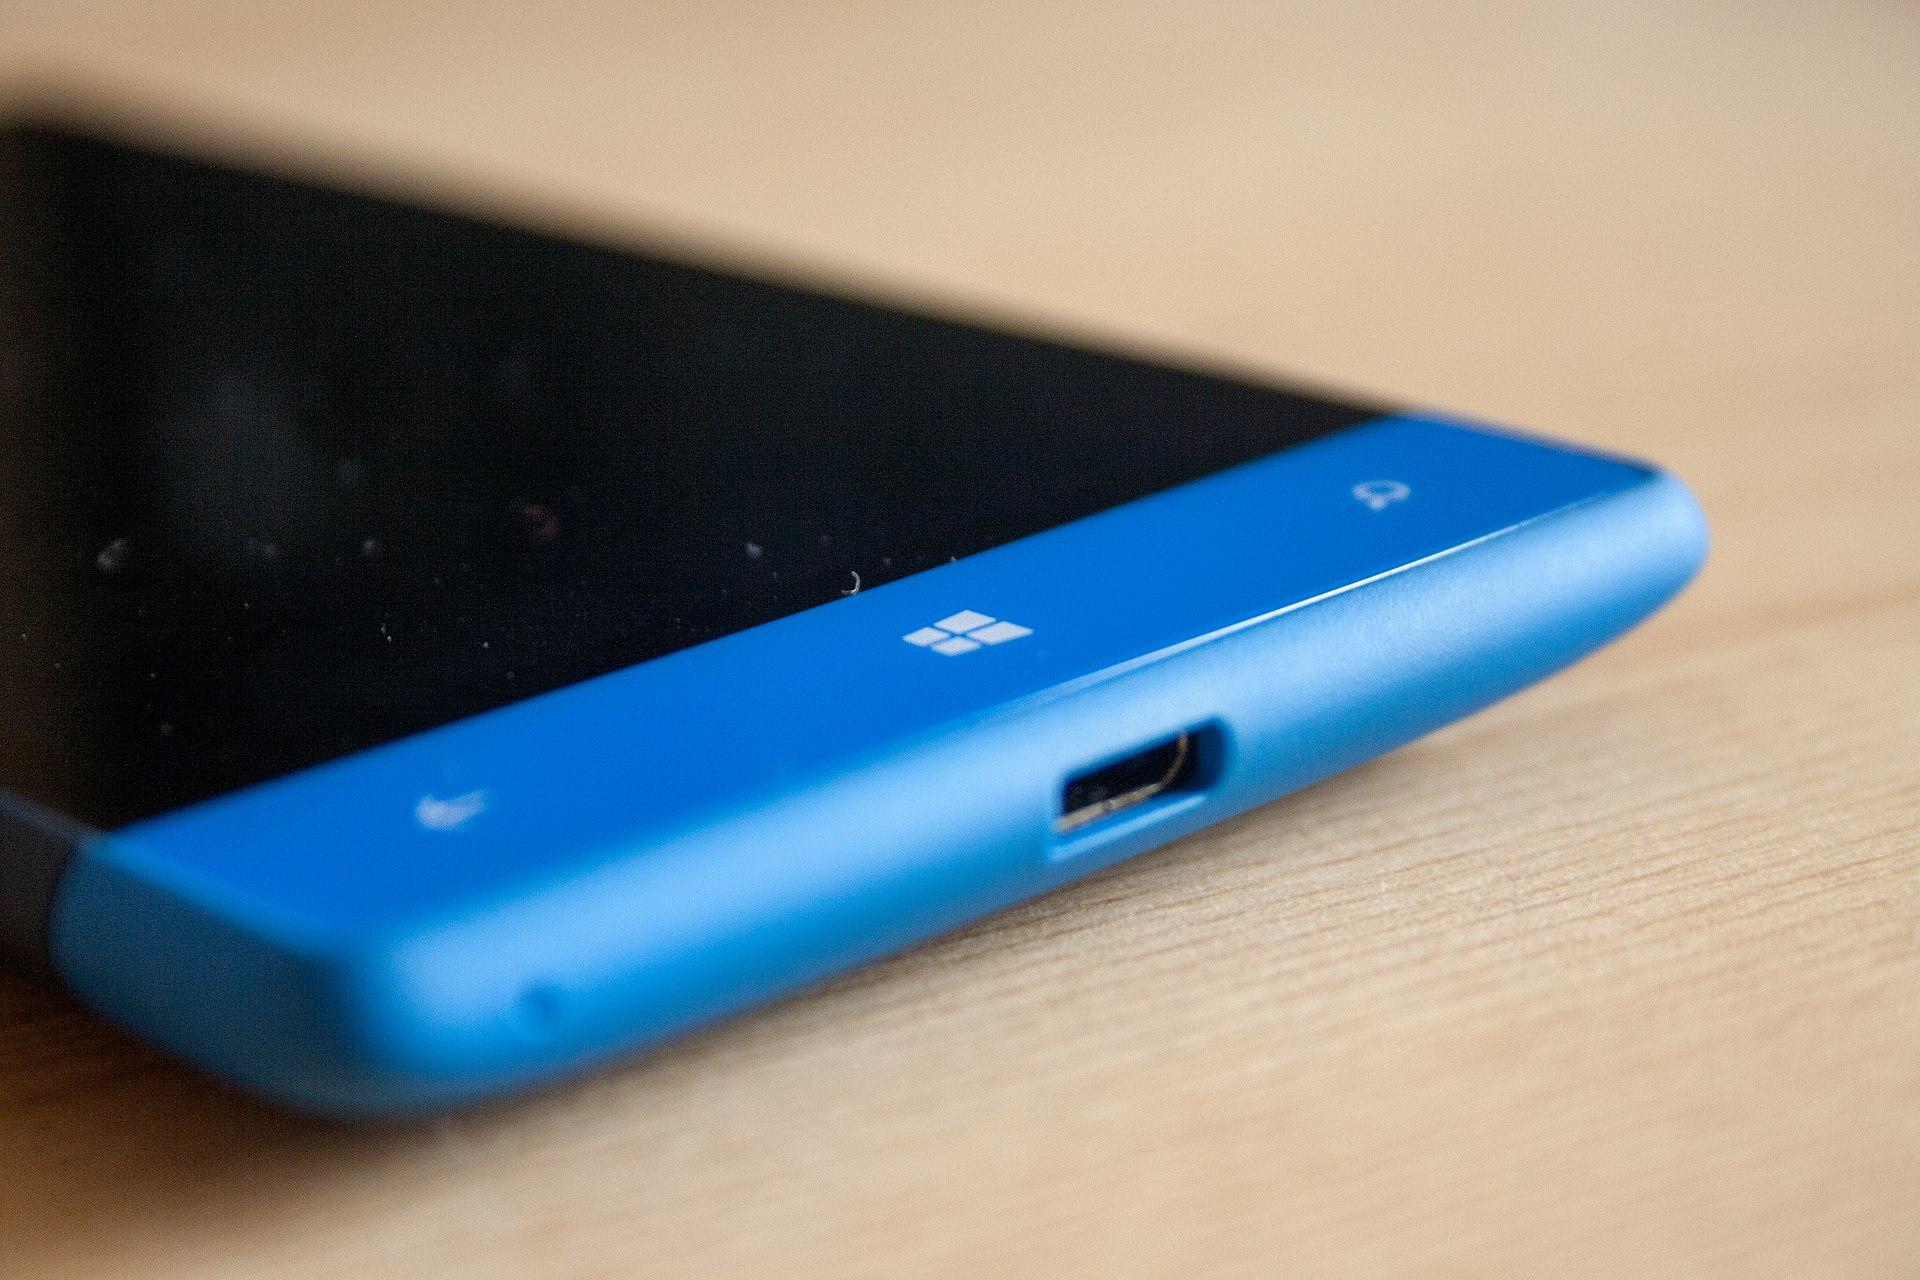 Ambient Light Sensor >> HTC Windows Phone 8S - Wikipedia